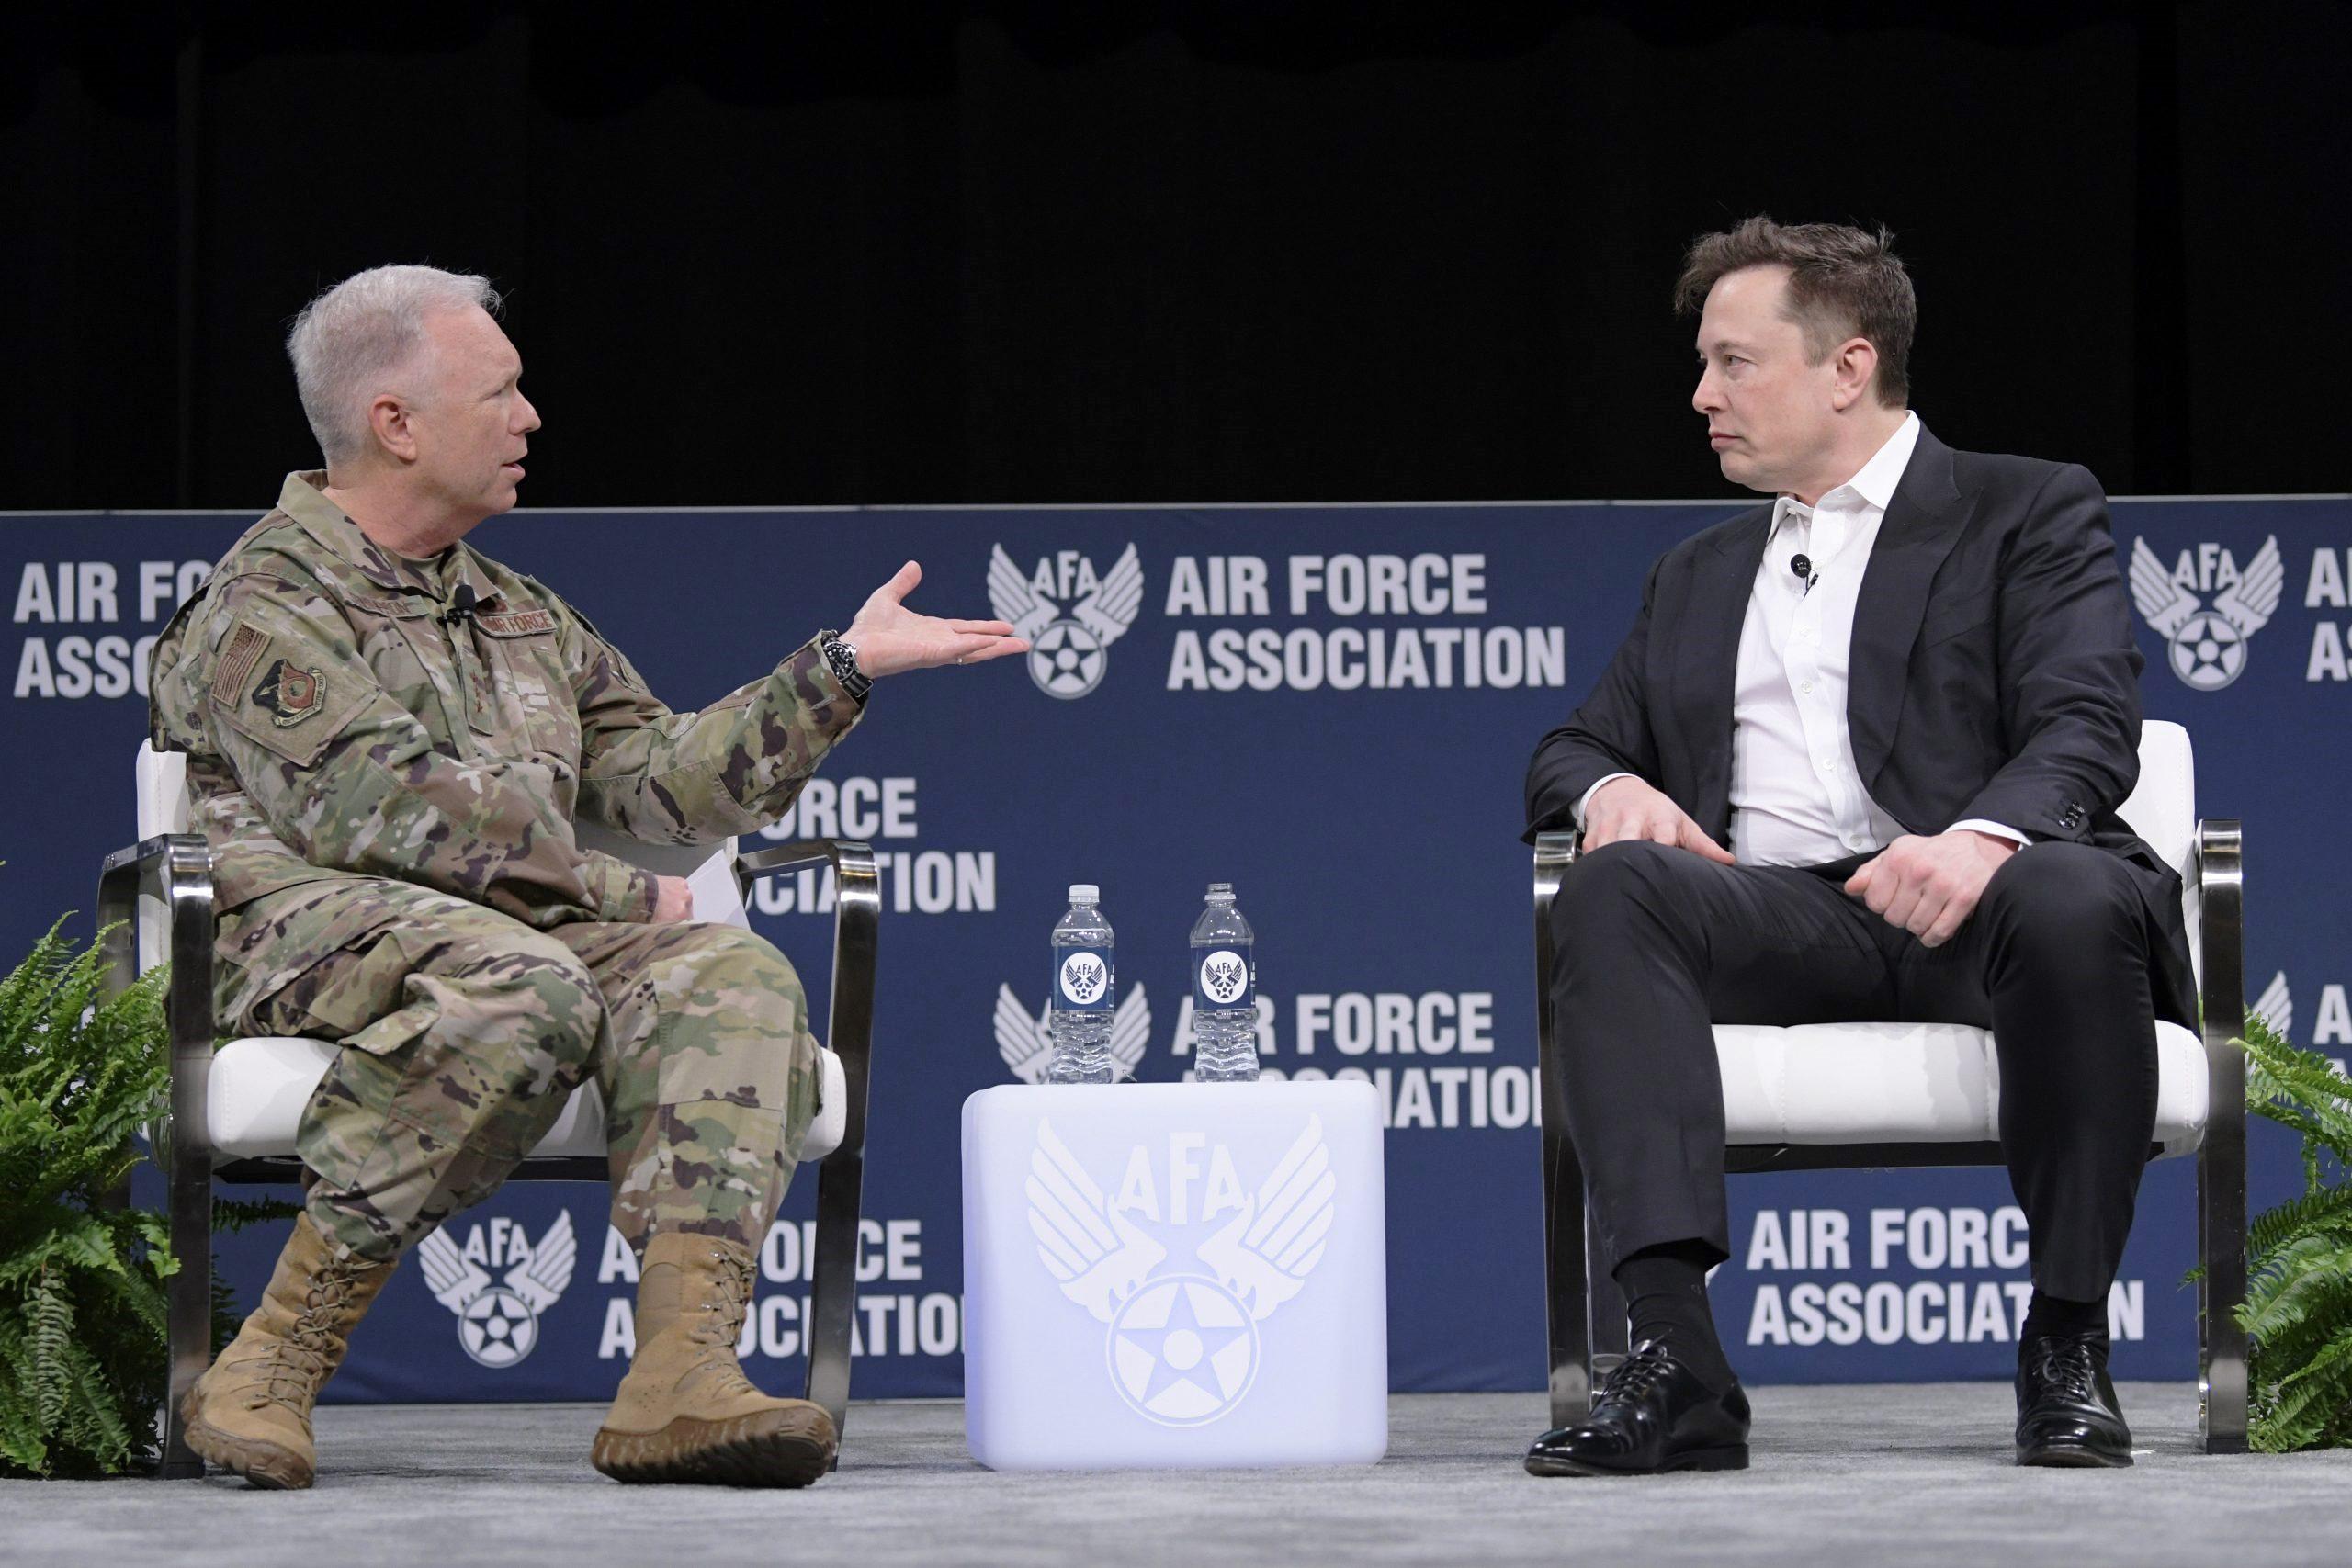 'The fighter jet era has passed', says Elon Musk